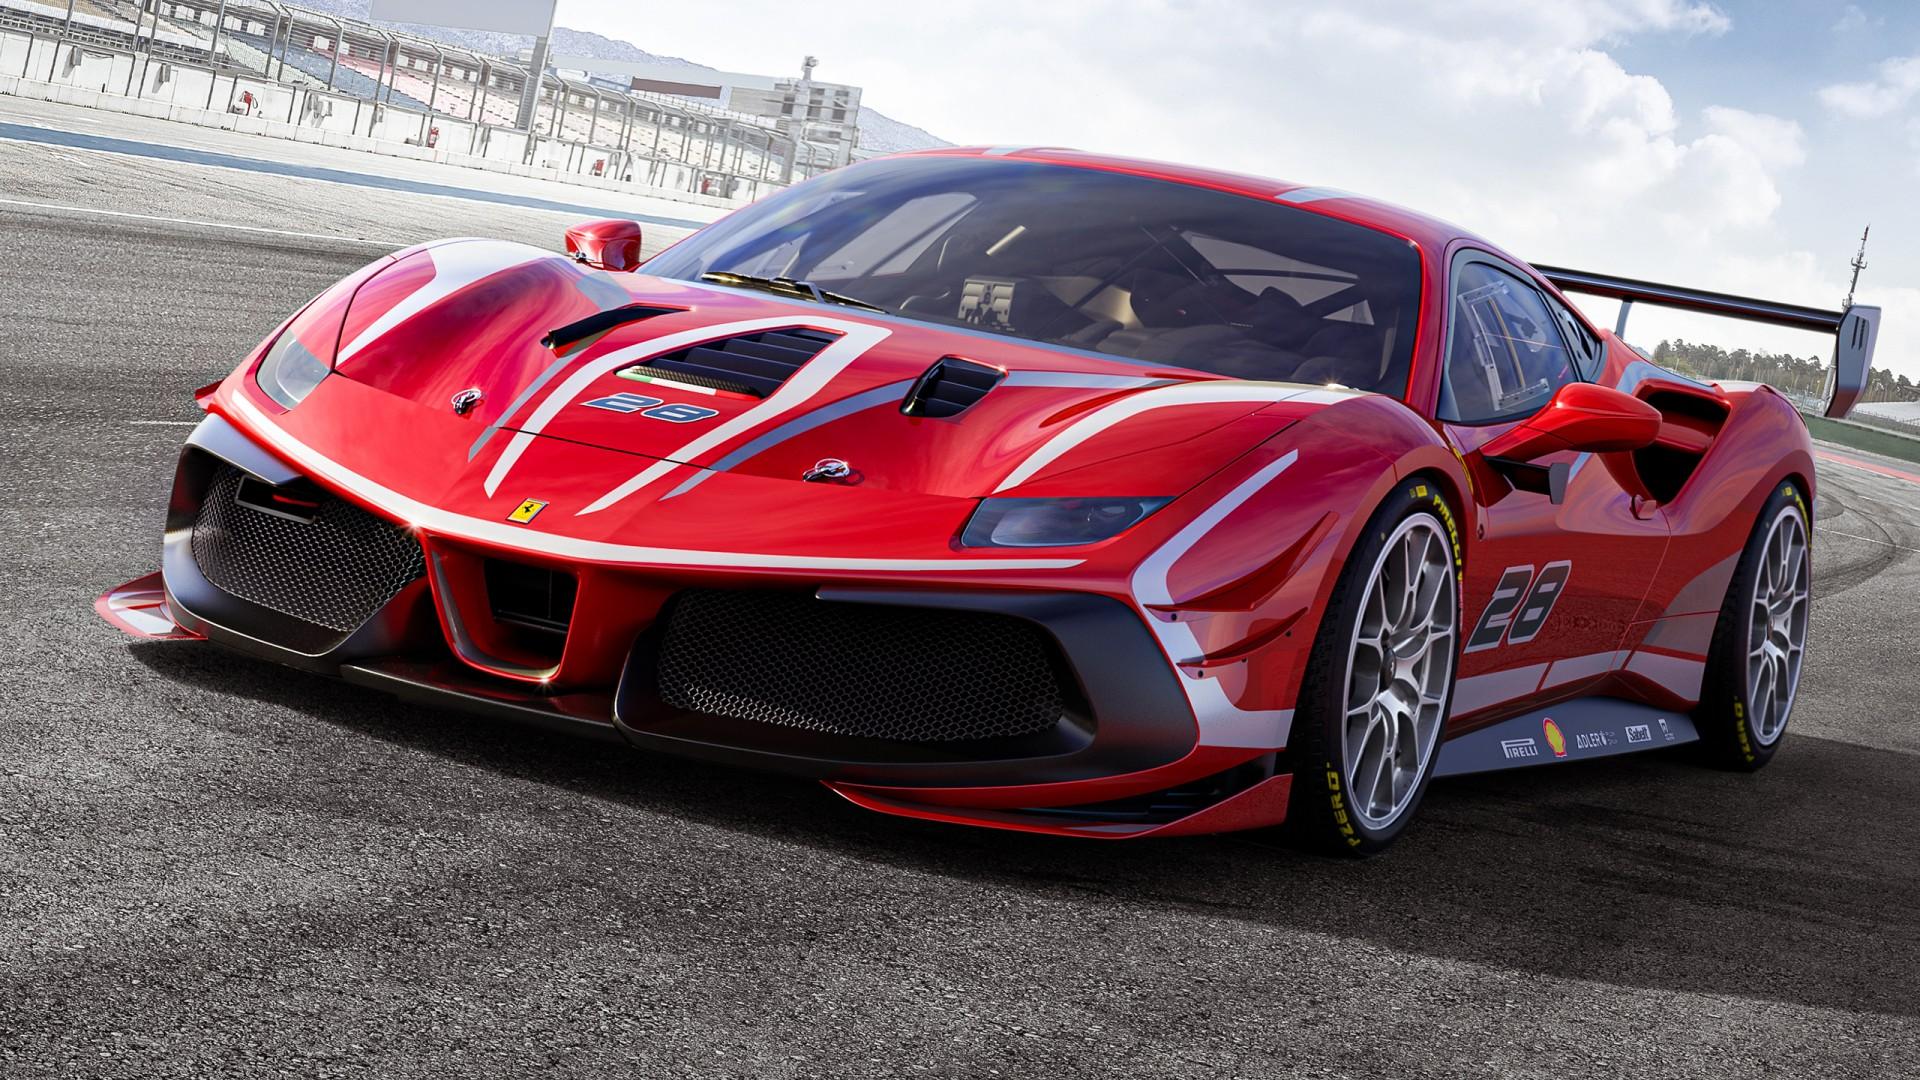 36] Ferrari 488 Challenge Evo 2020 Wallpapers on WallpaperSafari 1920x1080